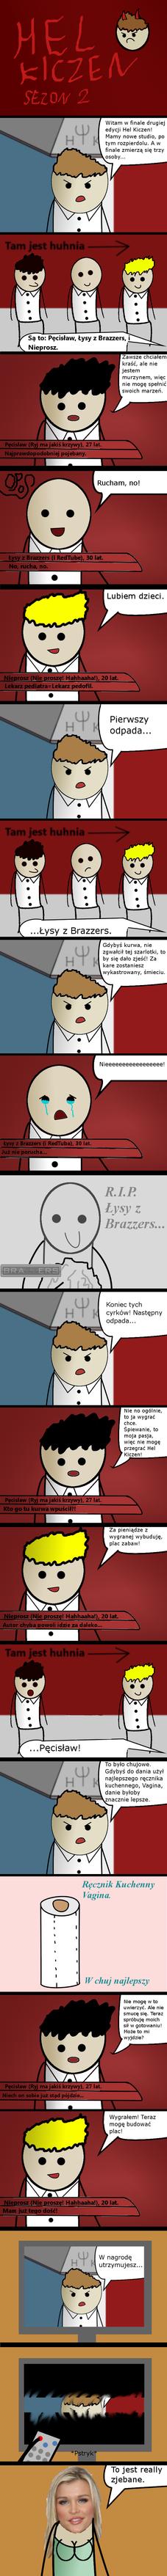 Hel Kiczen  Sezon 2 Komiks nr. 87 by Norxxq